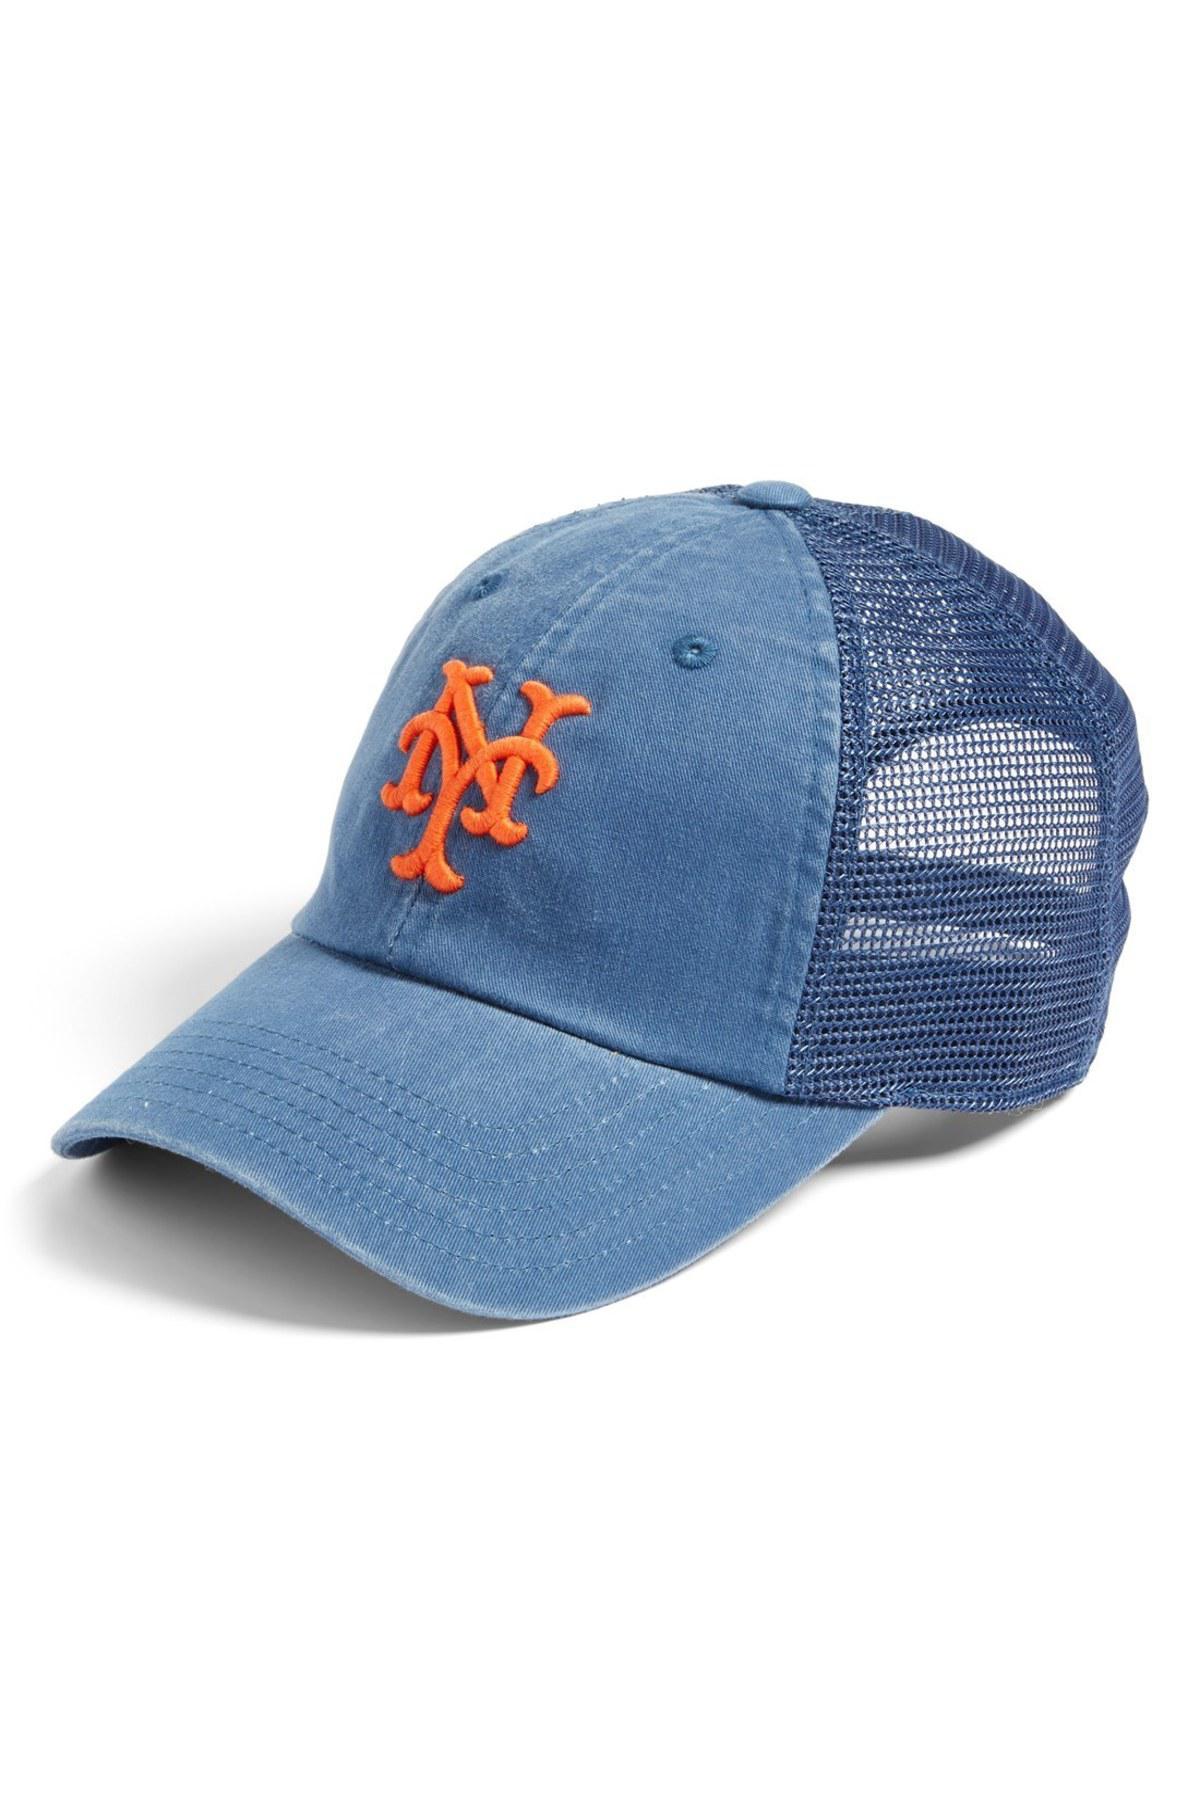 ... get american needle. mens blue raglan bones new york mets baseball hat  cbfd4 cdd2c 2180e2b6945a